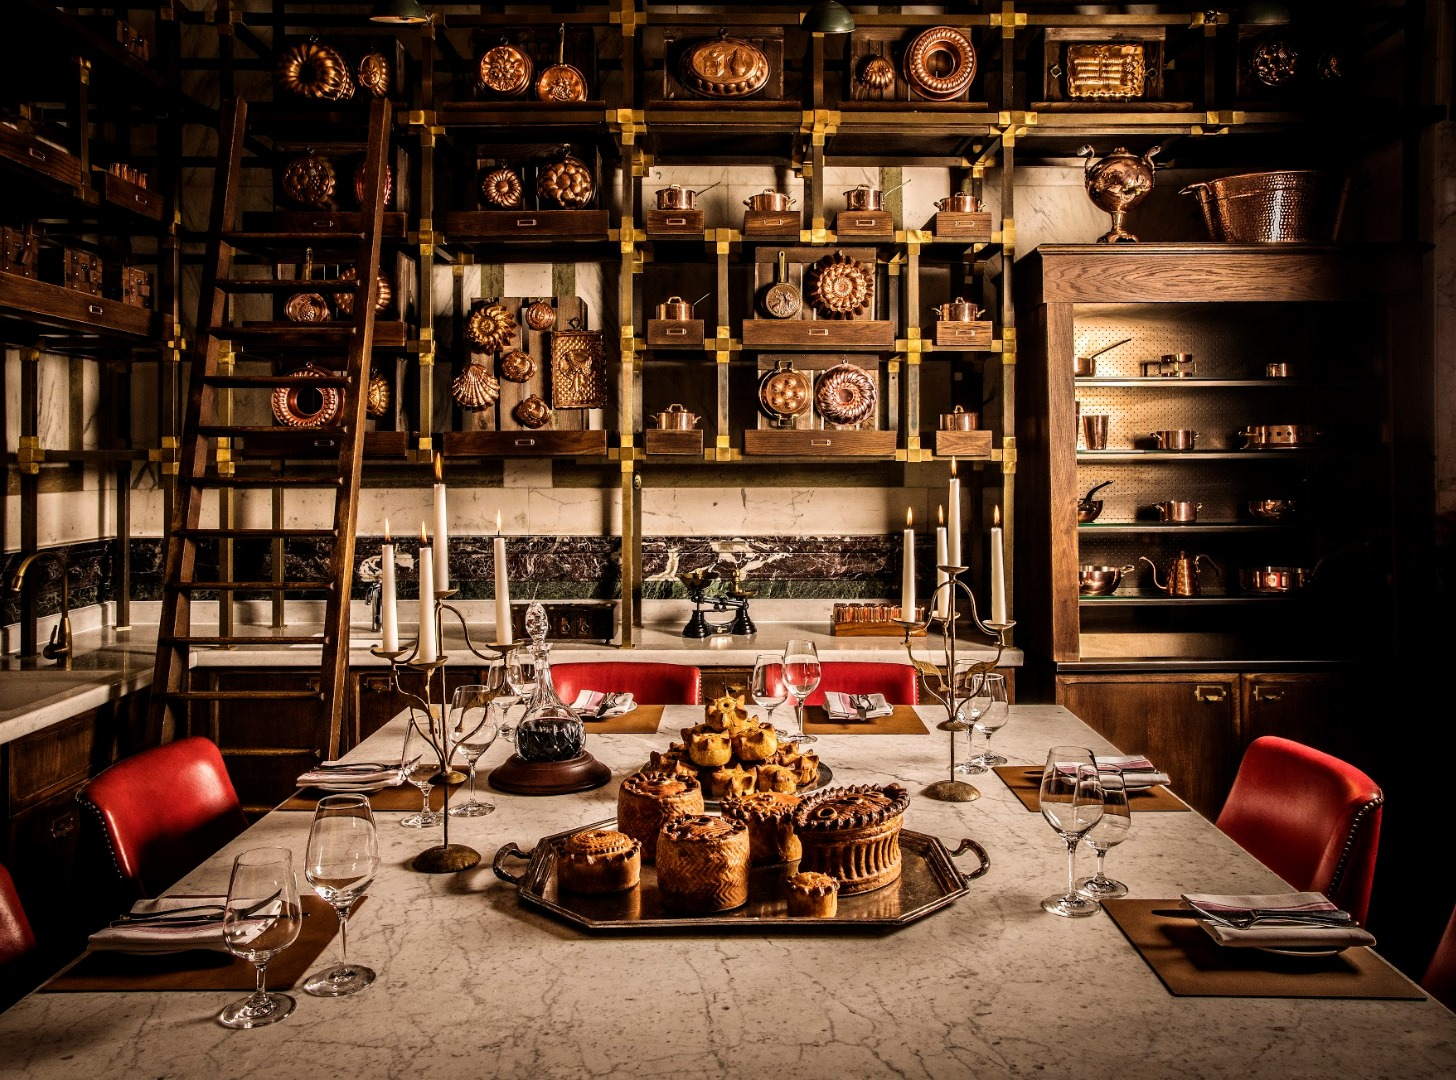 Image of Pie Room Rosewood London England United Kingdom, Dining